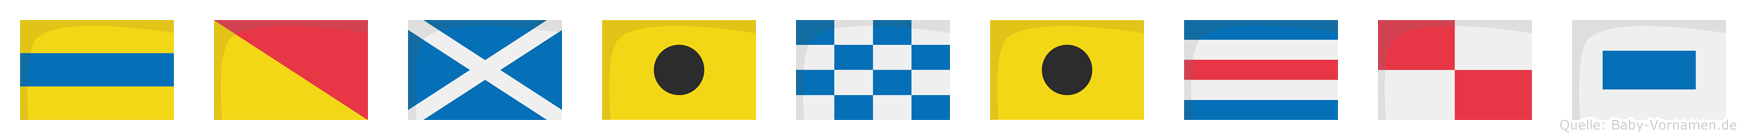 Dominicus im Flaggenalphabet